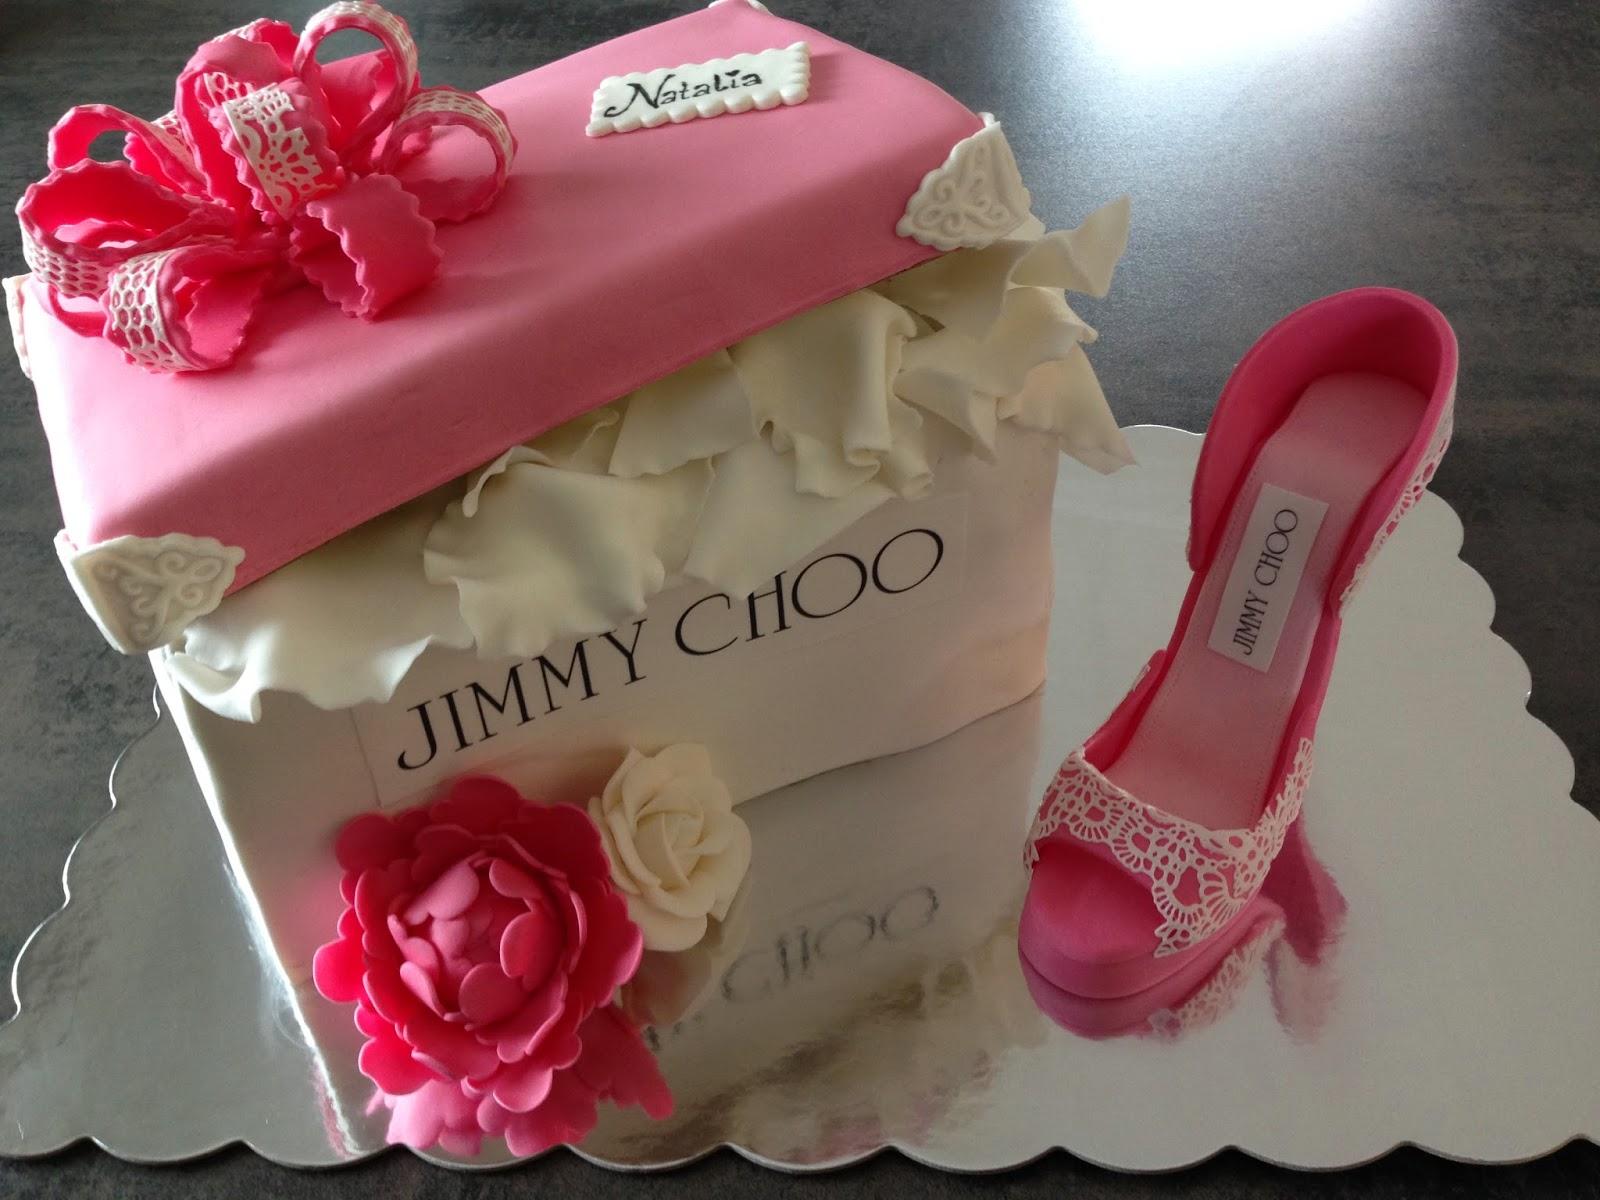 og Jimmy design kaker eske Marlenes kake sko Choo og xYFOxqwf